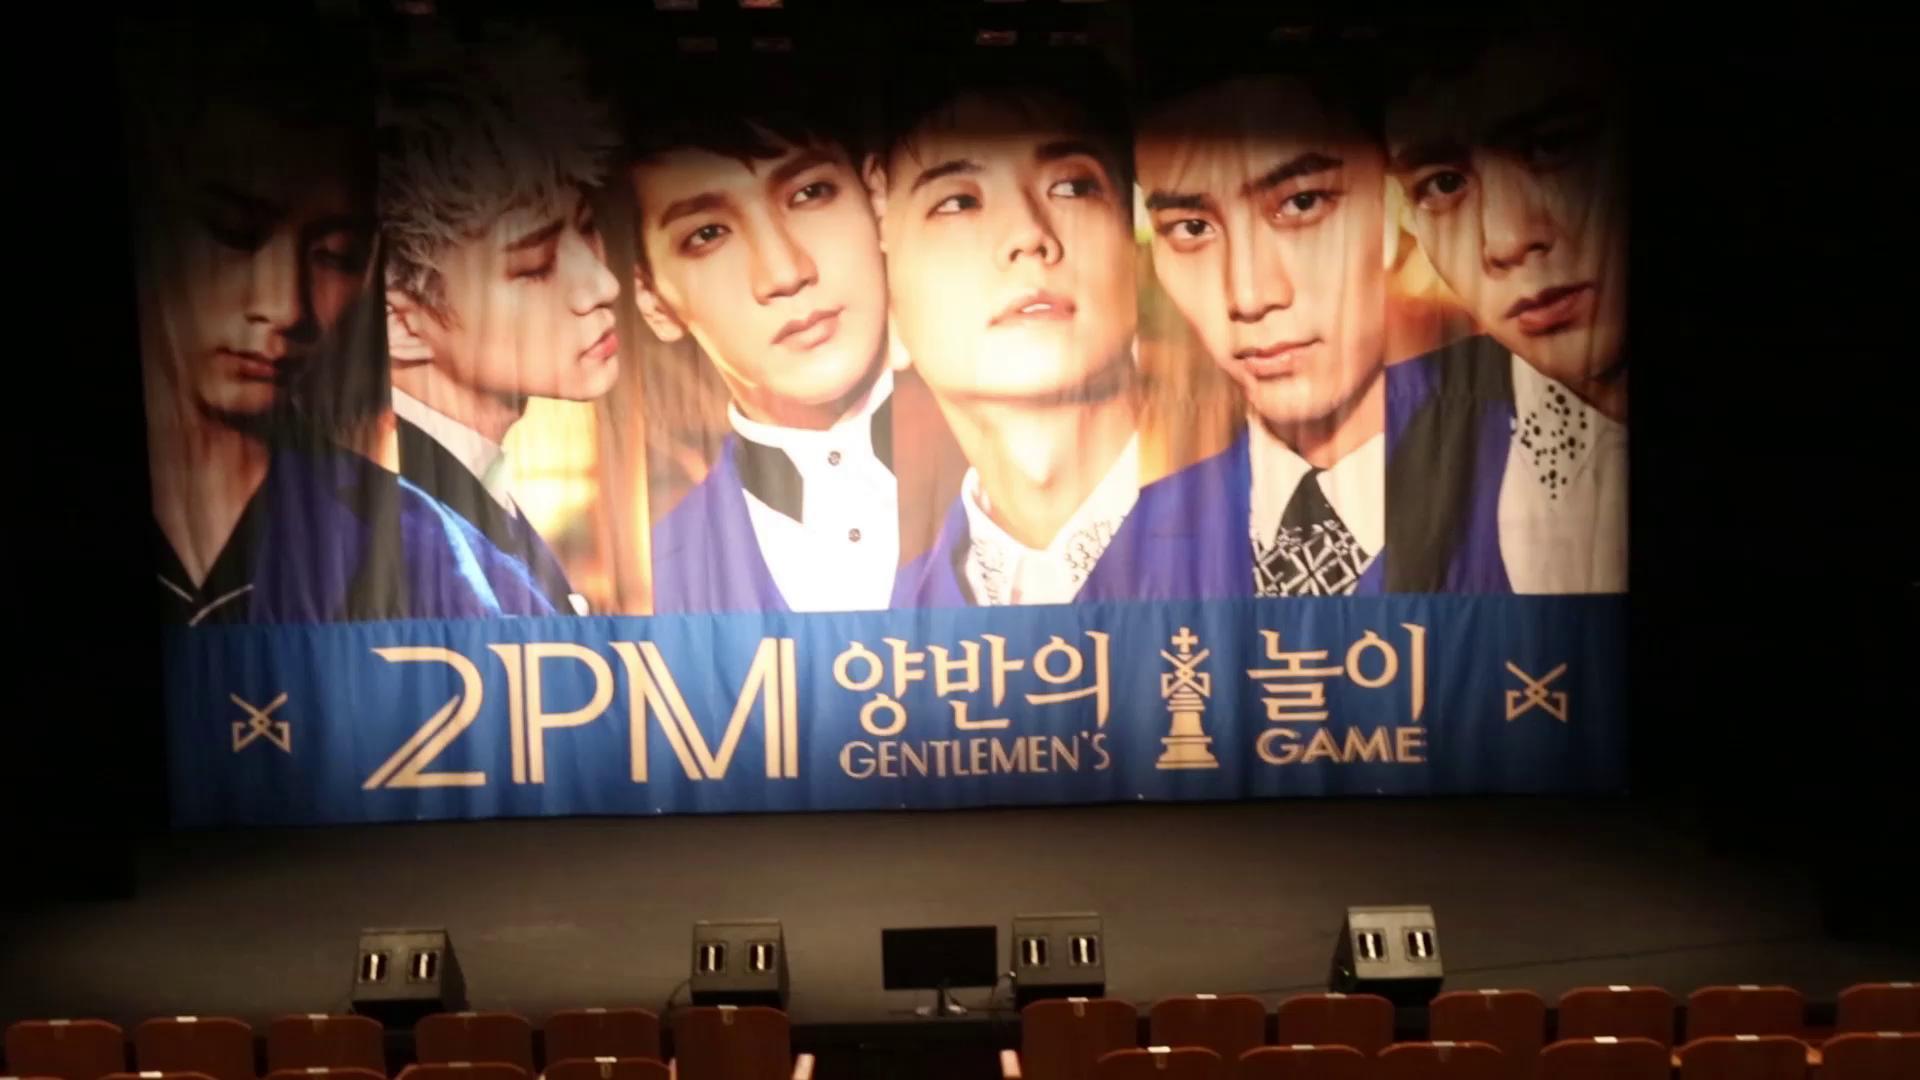 2PM 미니팬미팅 <양반의 놀이> 비하인드